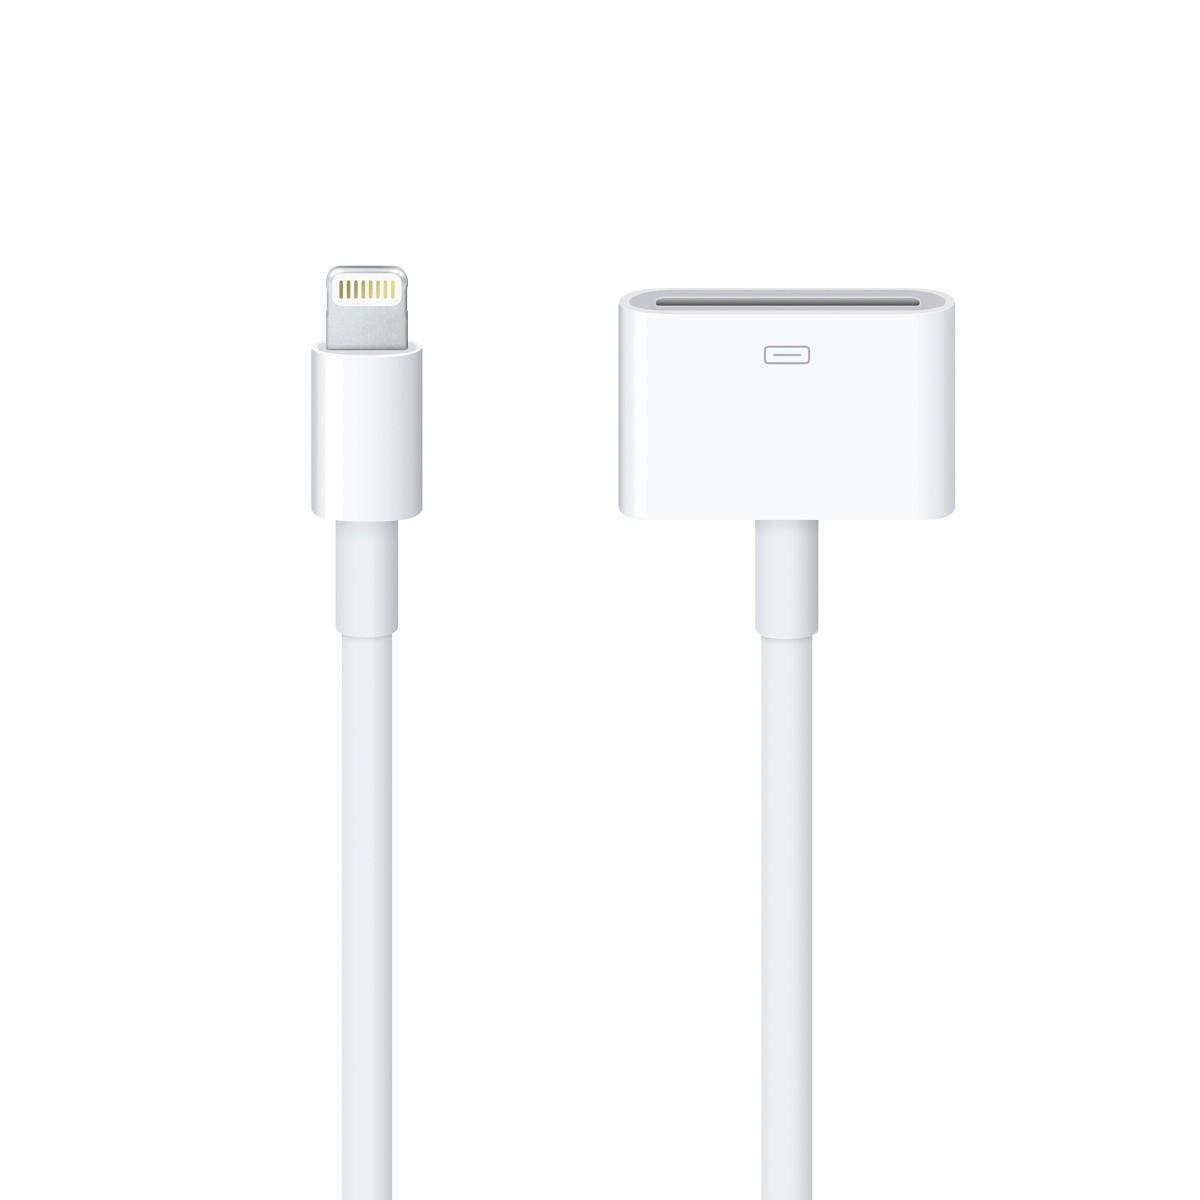 Apple Lightning към 30-pin адаптер - 0,2 м